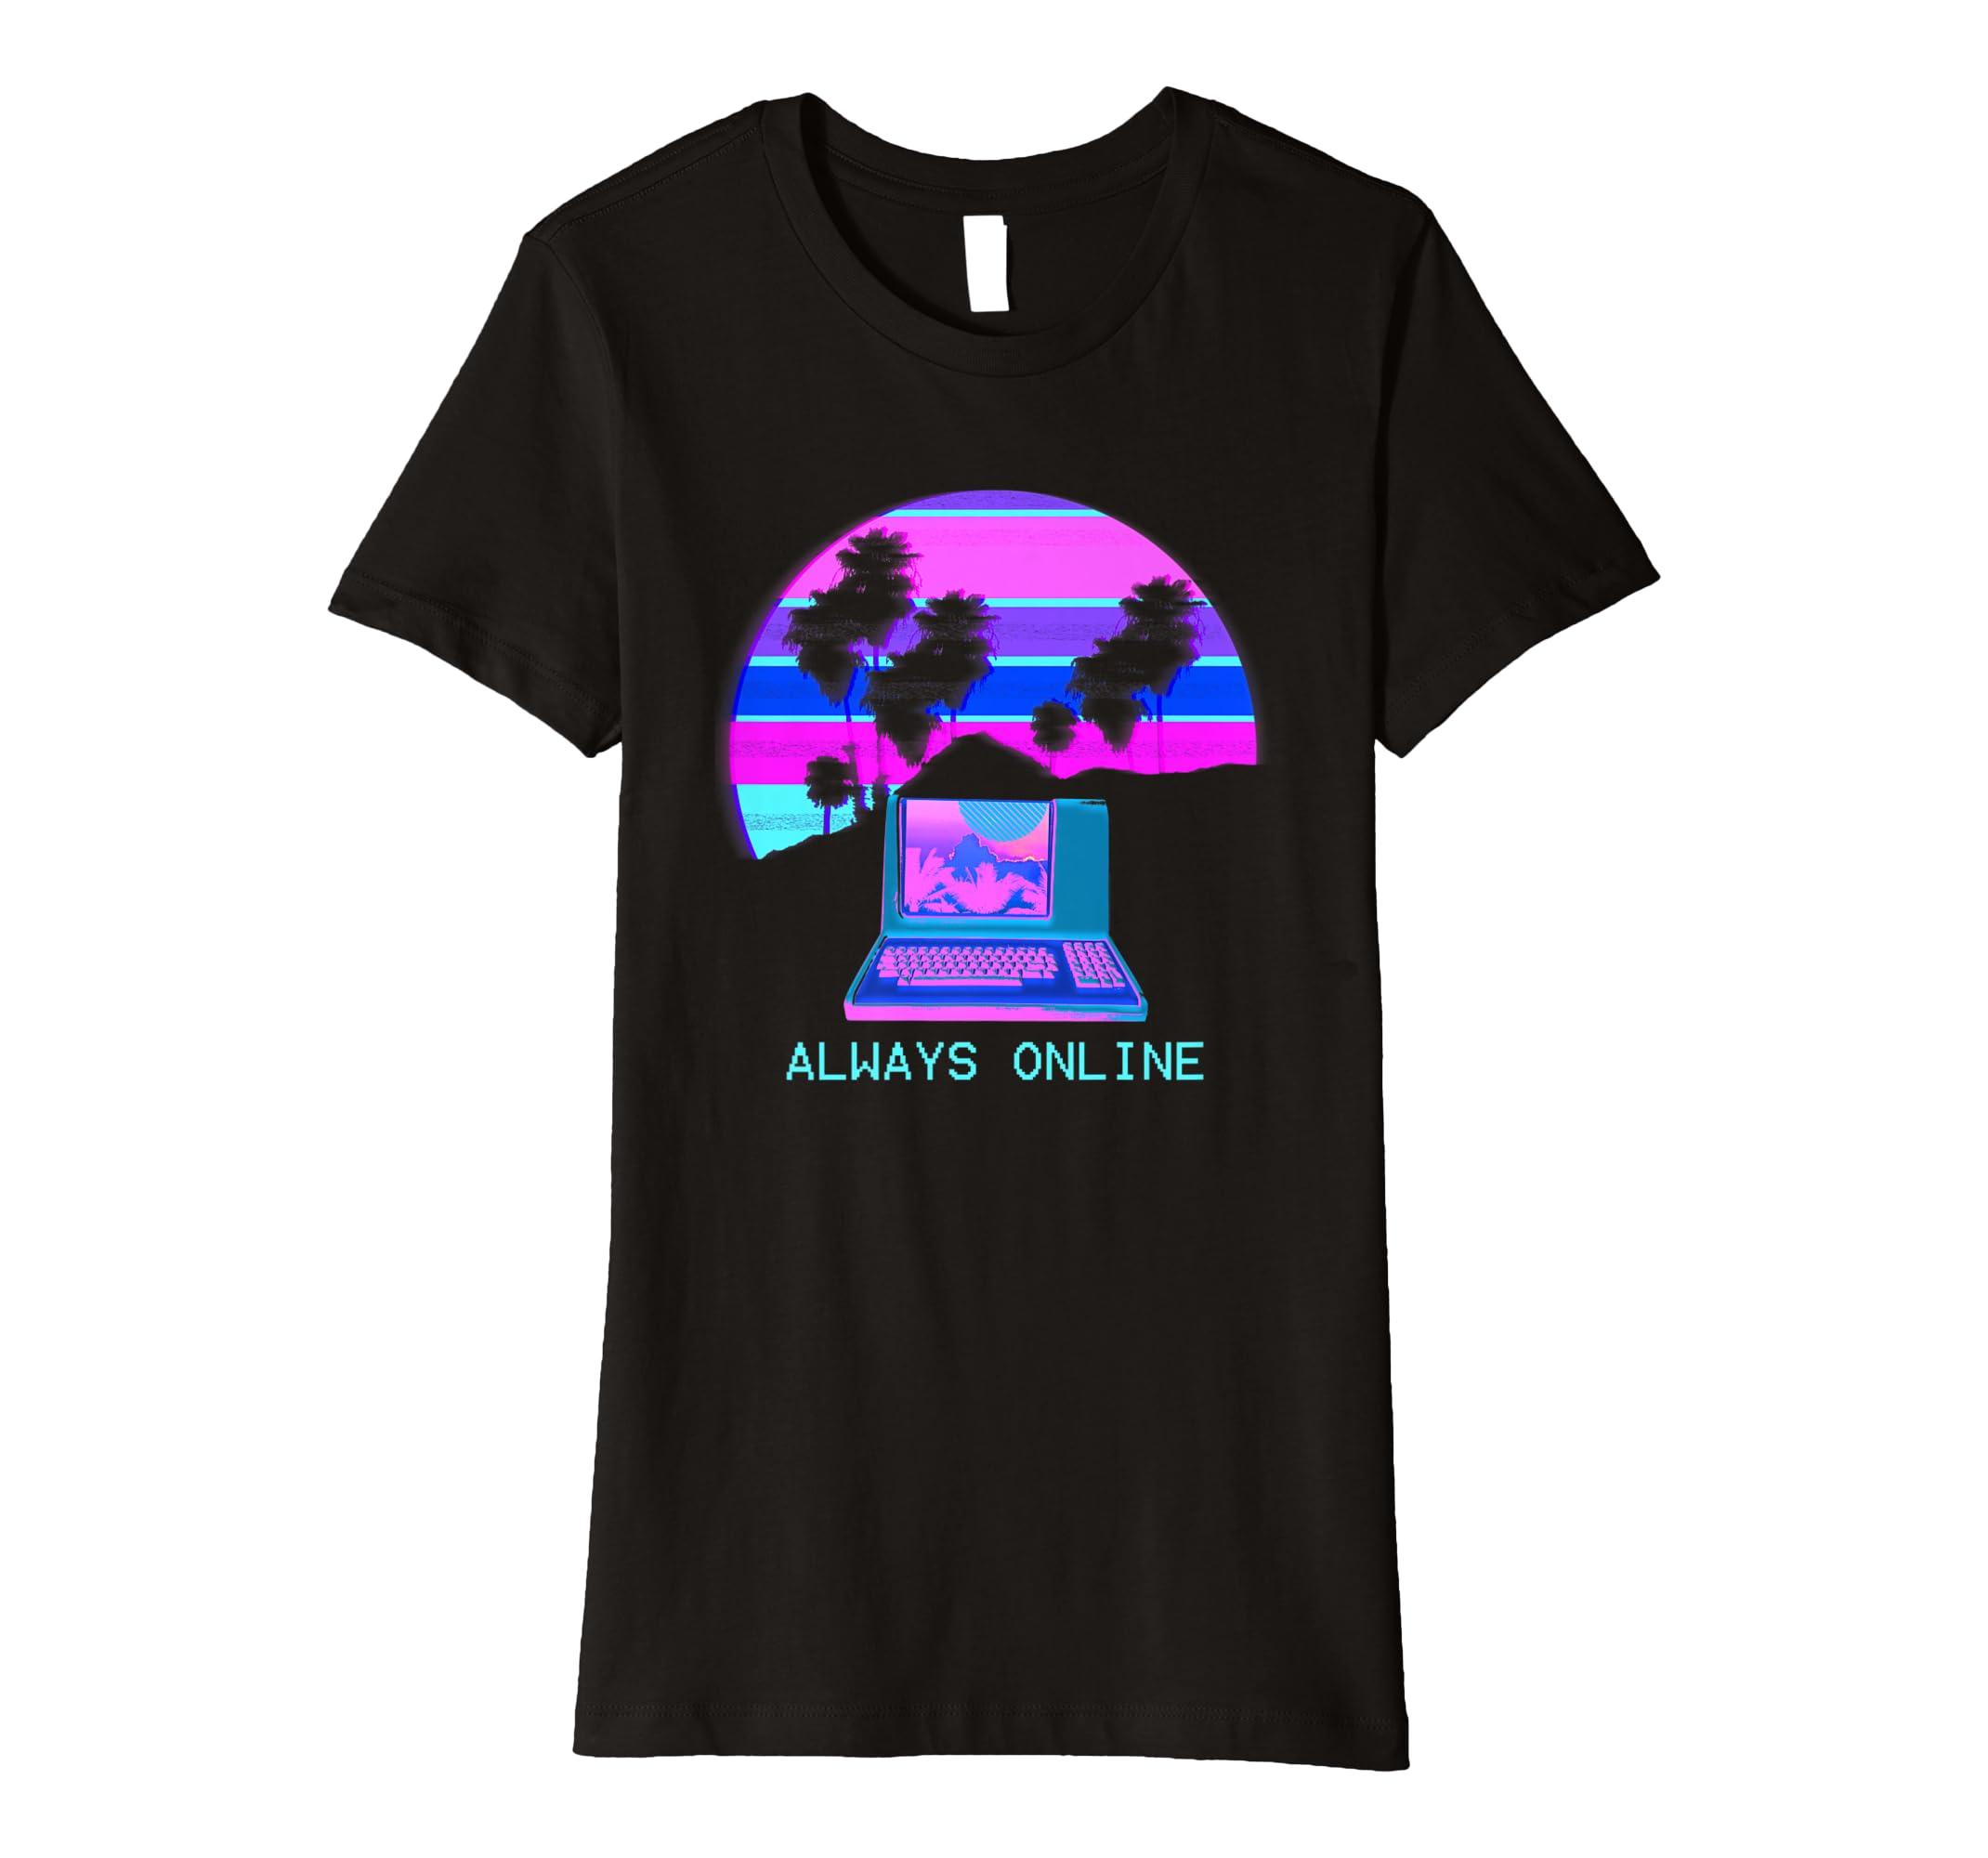 94ef03d9aa91f Vaporwave Vintage Computer TShirt Always Online Sunset  Amazon.co.uk   Clothing